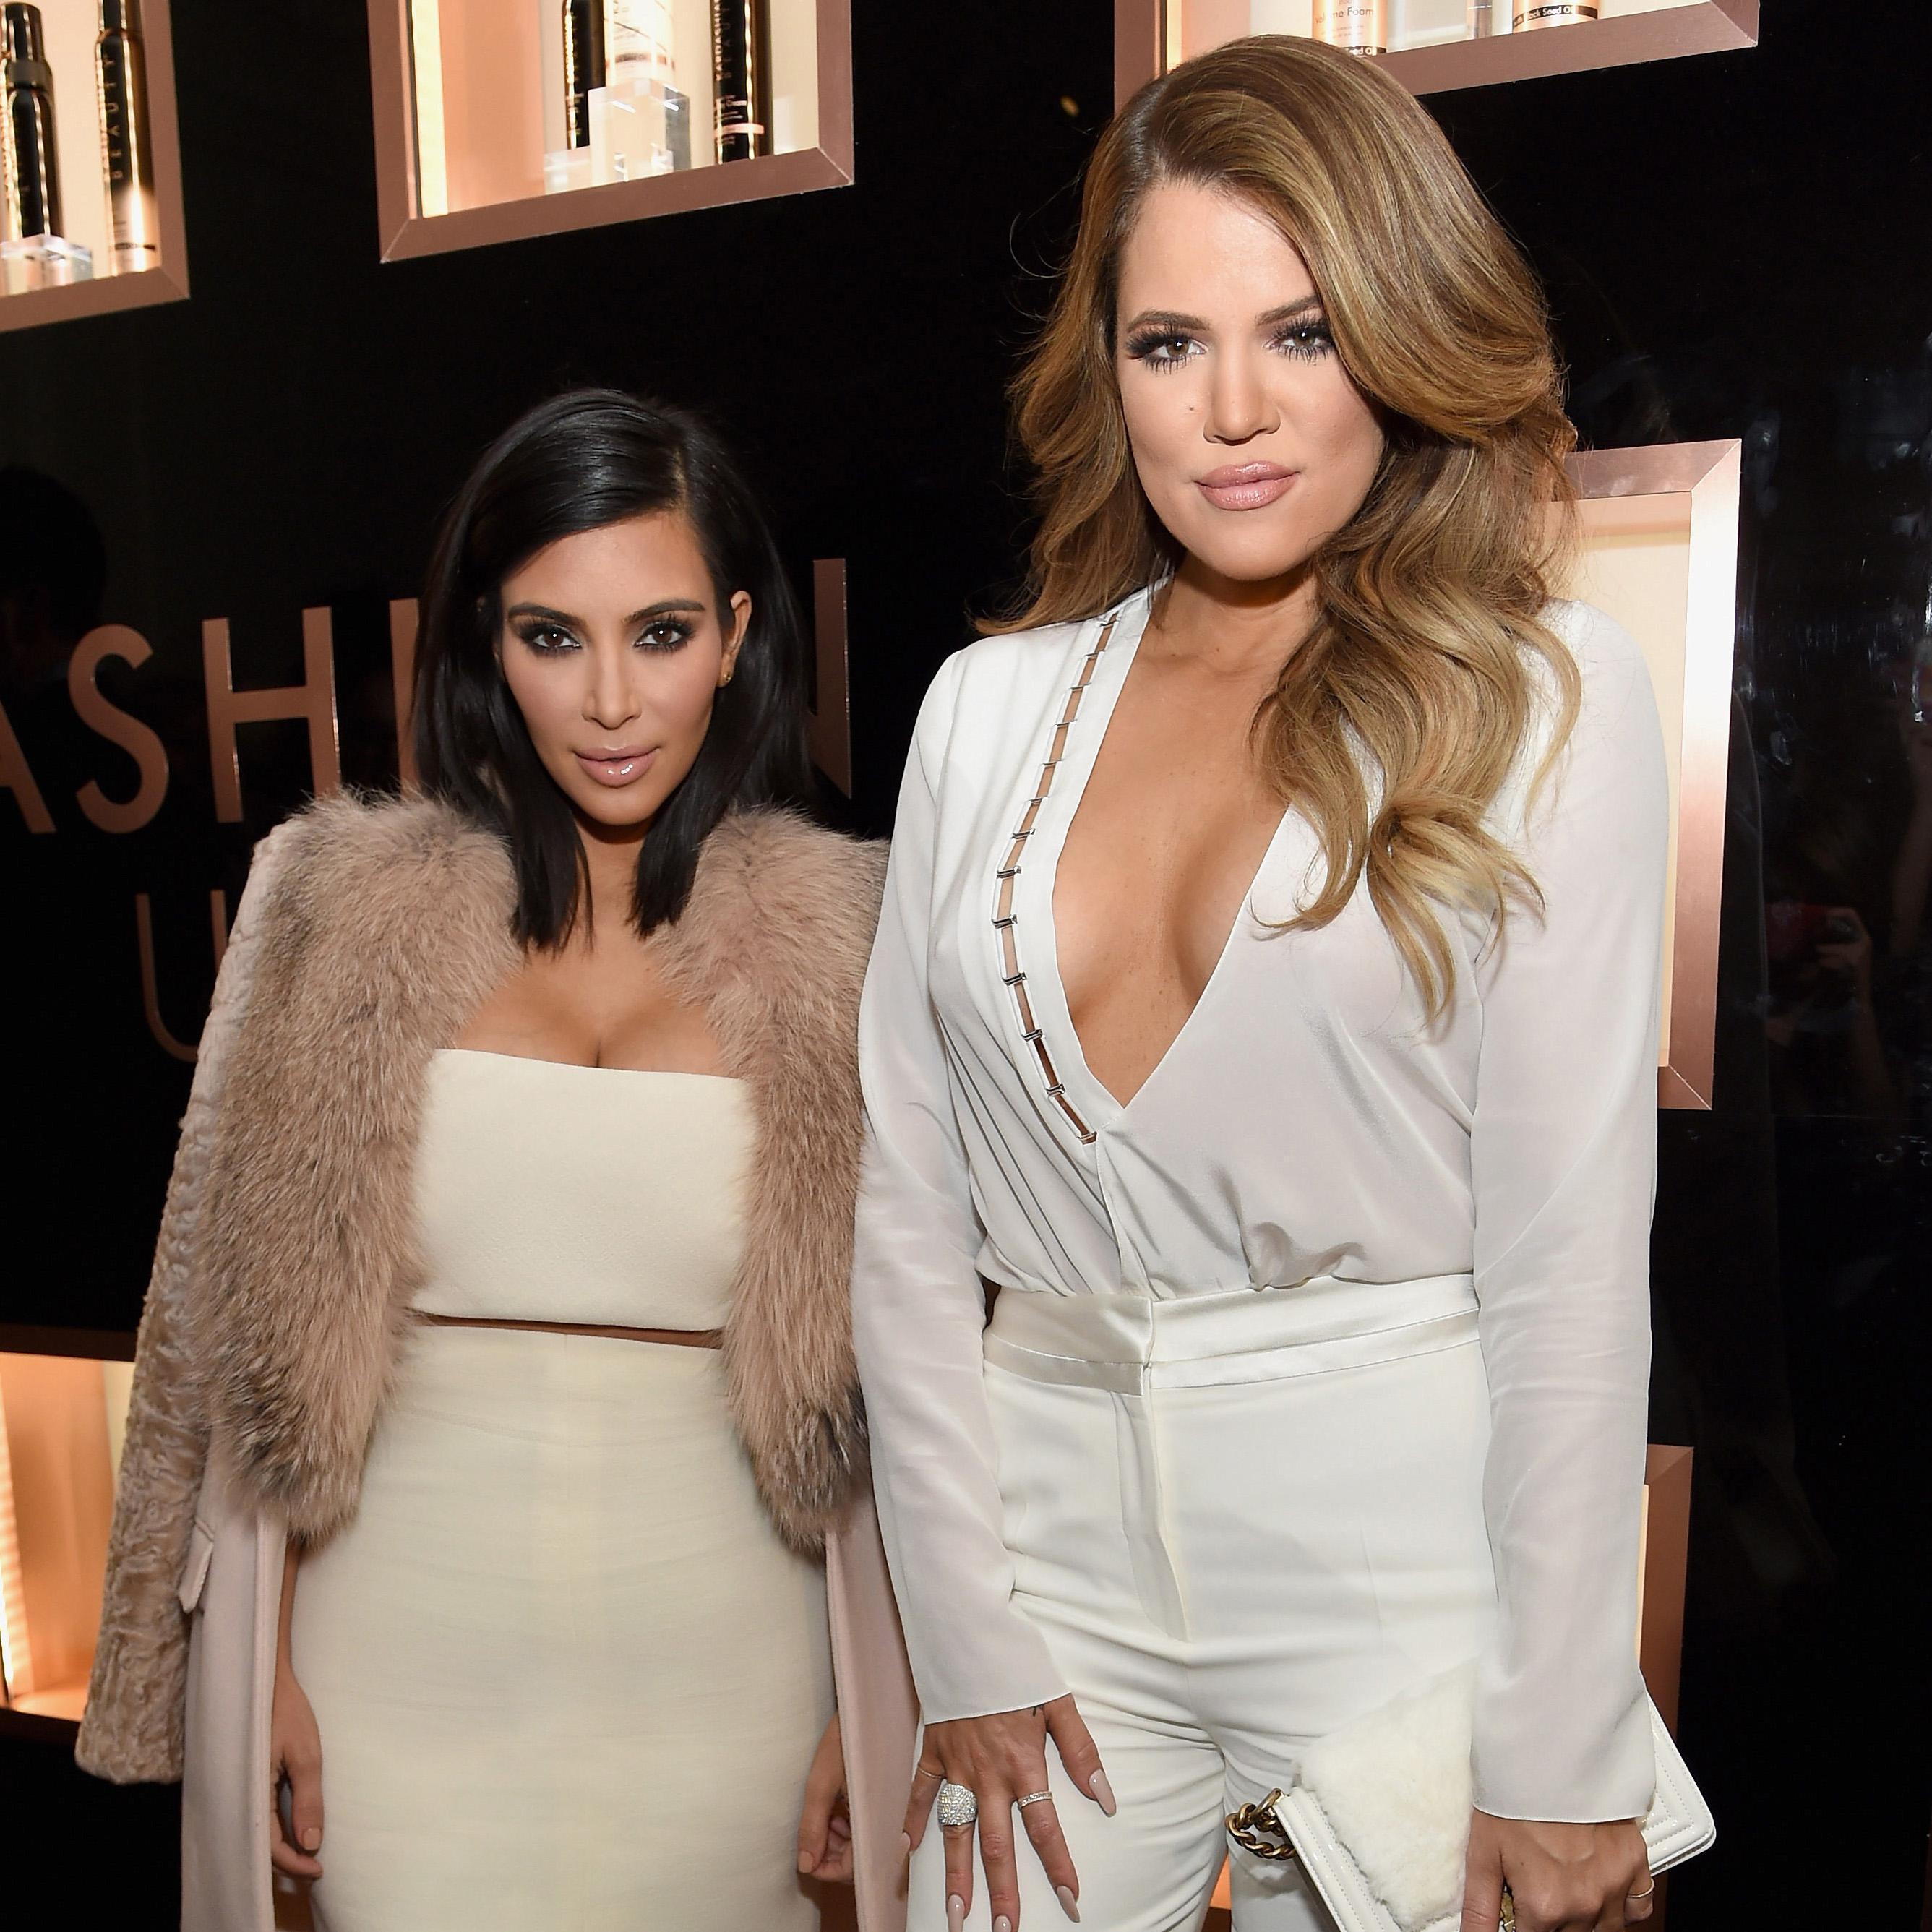 NEW YORK, NY - FEBRUARY 10:  Kim Kardashian West, Khloe Kardashian and Farouk Systems, Inc. Celebrate the Launch of Kardashian Beauty at Academy Mansion on February 10, 2015 in New York City.  (Photo by Jamie McCarthy/WireImage for Kardashian Beauty)